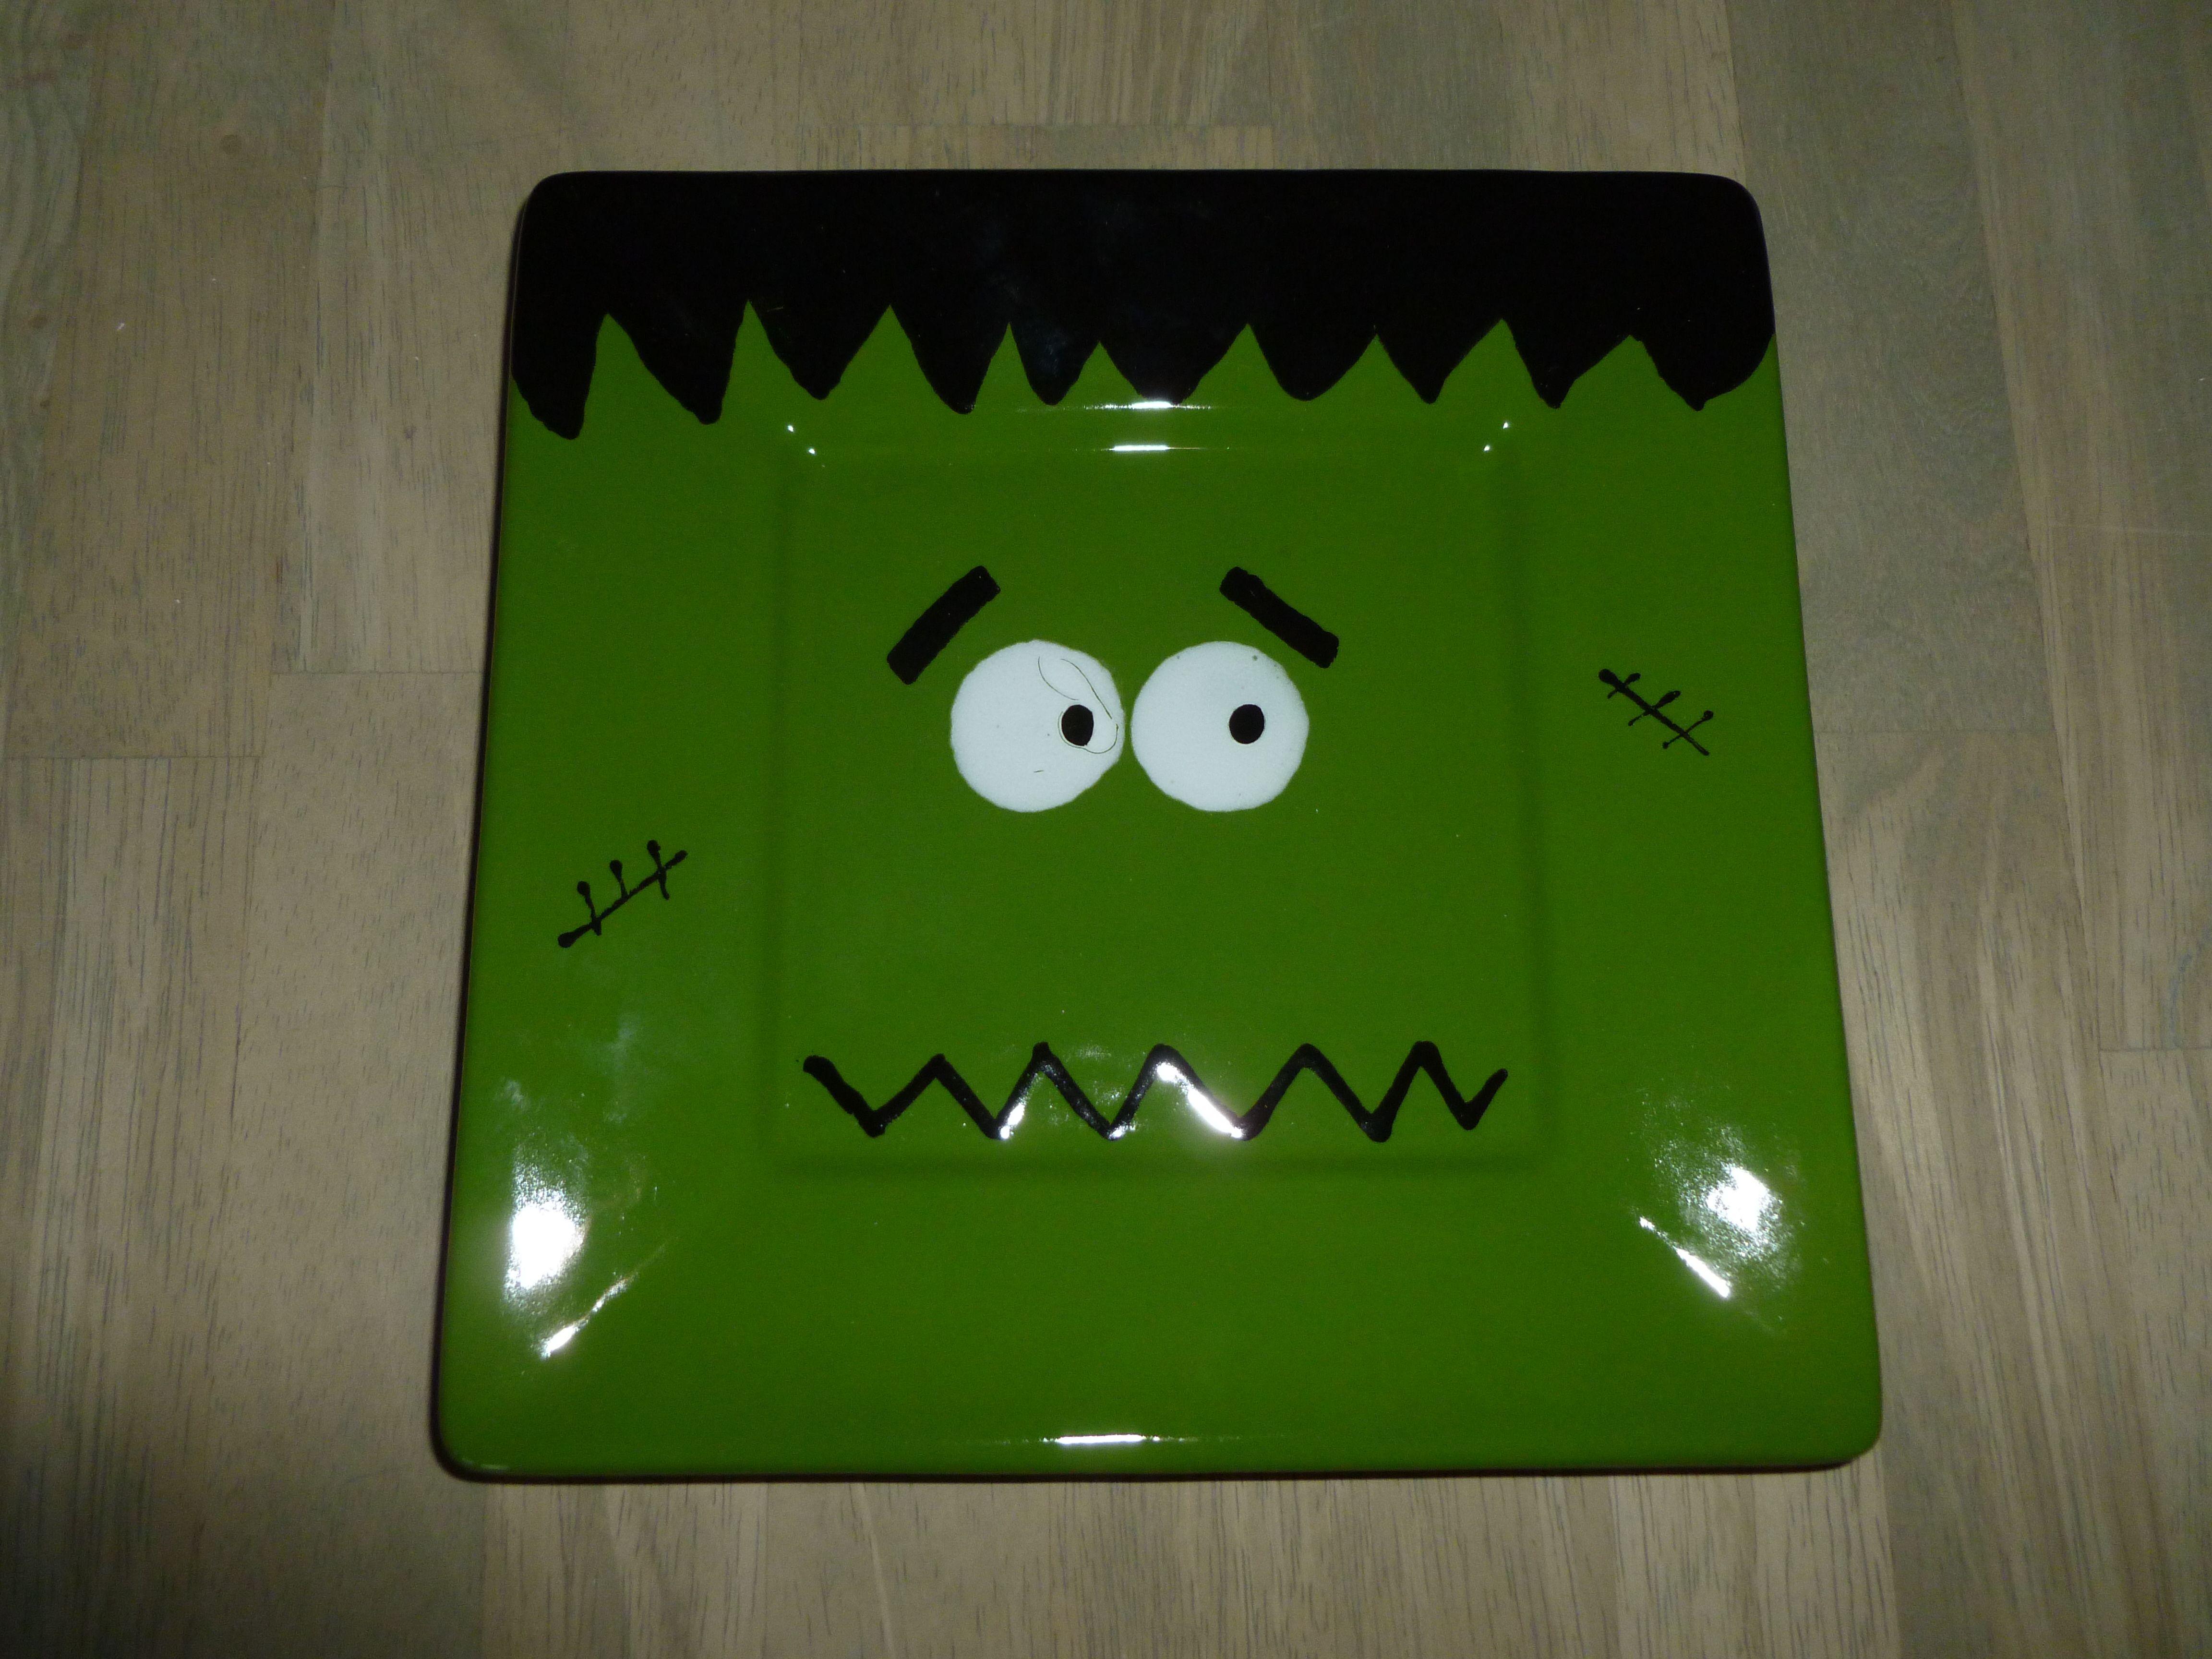 Frankensteinu0027s Monster Plate! & Frankensteinu0027s Monster Plate! | Halloween Tricks and Treats ...